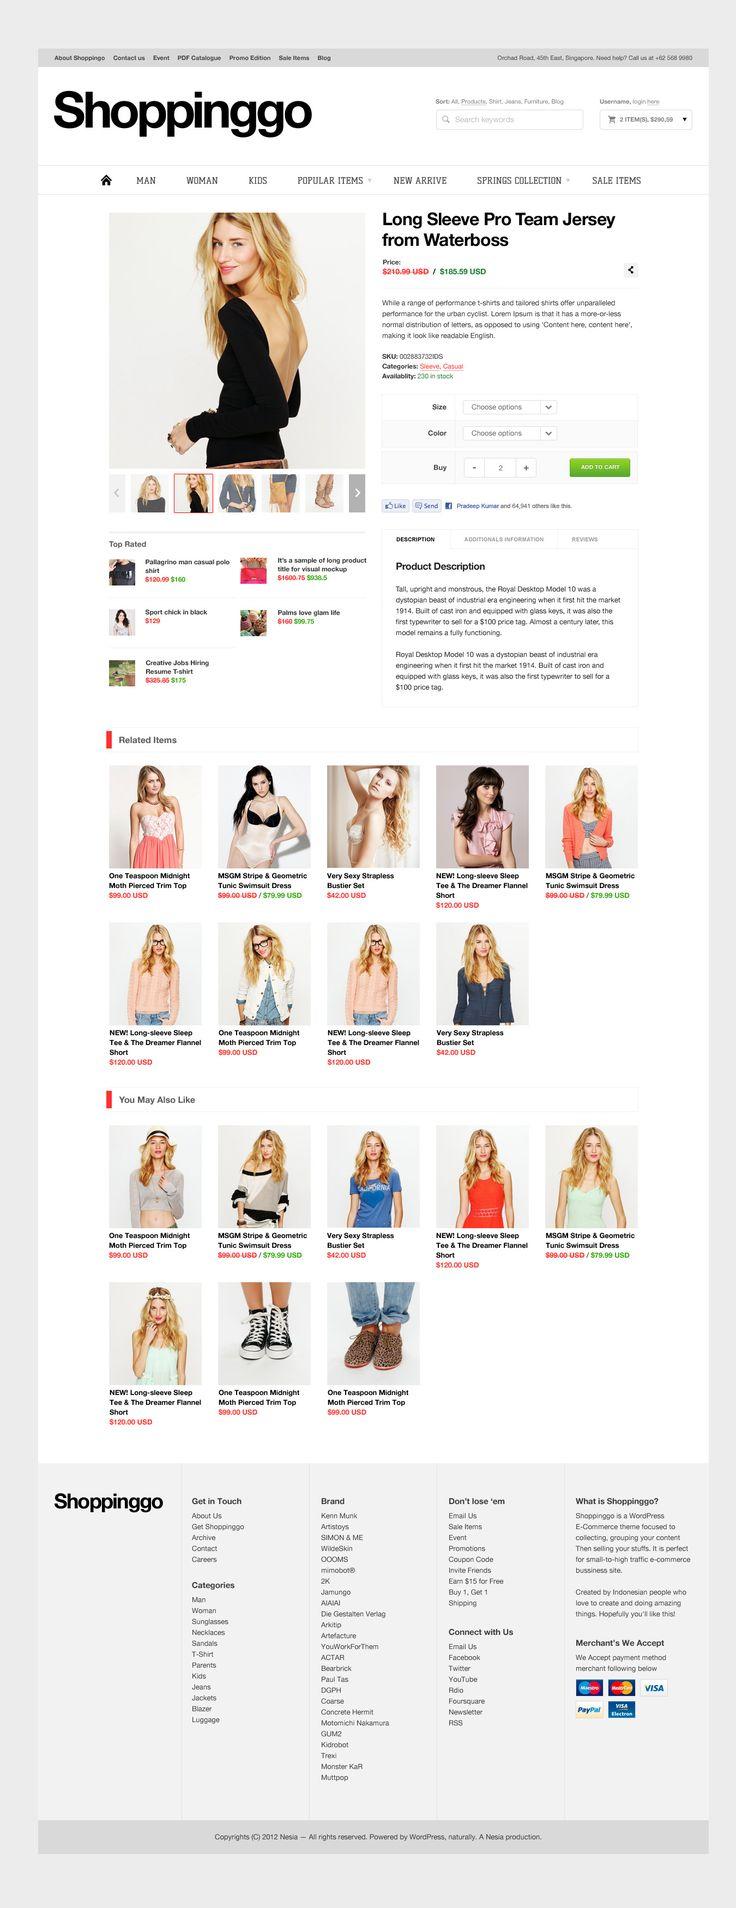 Shoppinggo - WordPress eCommerce Theme  #wordpress #theme #website #template #responsive #design #webdesign #flat #flatdesign #ecommerce #shop #clothing